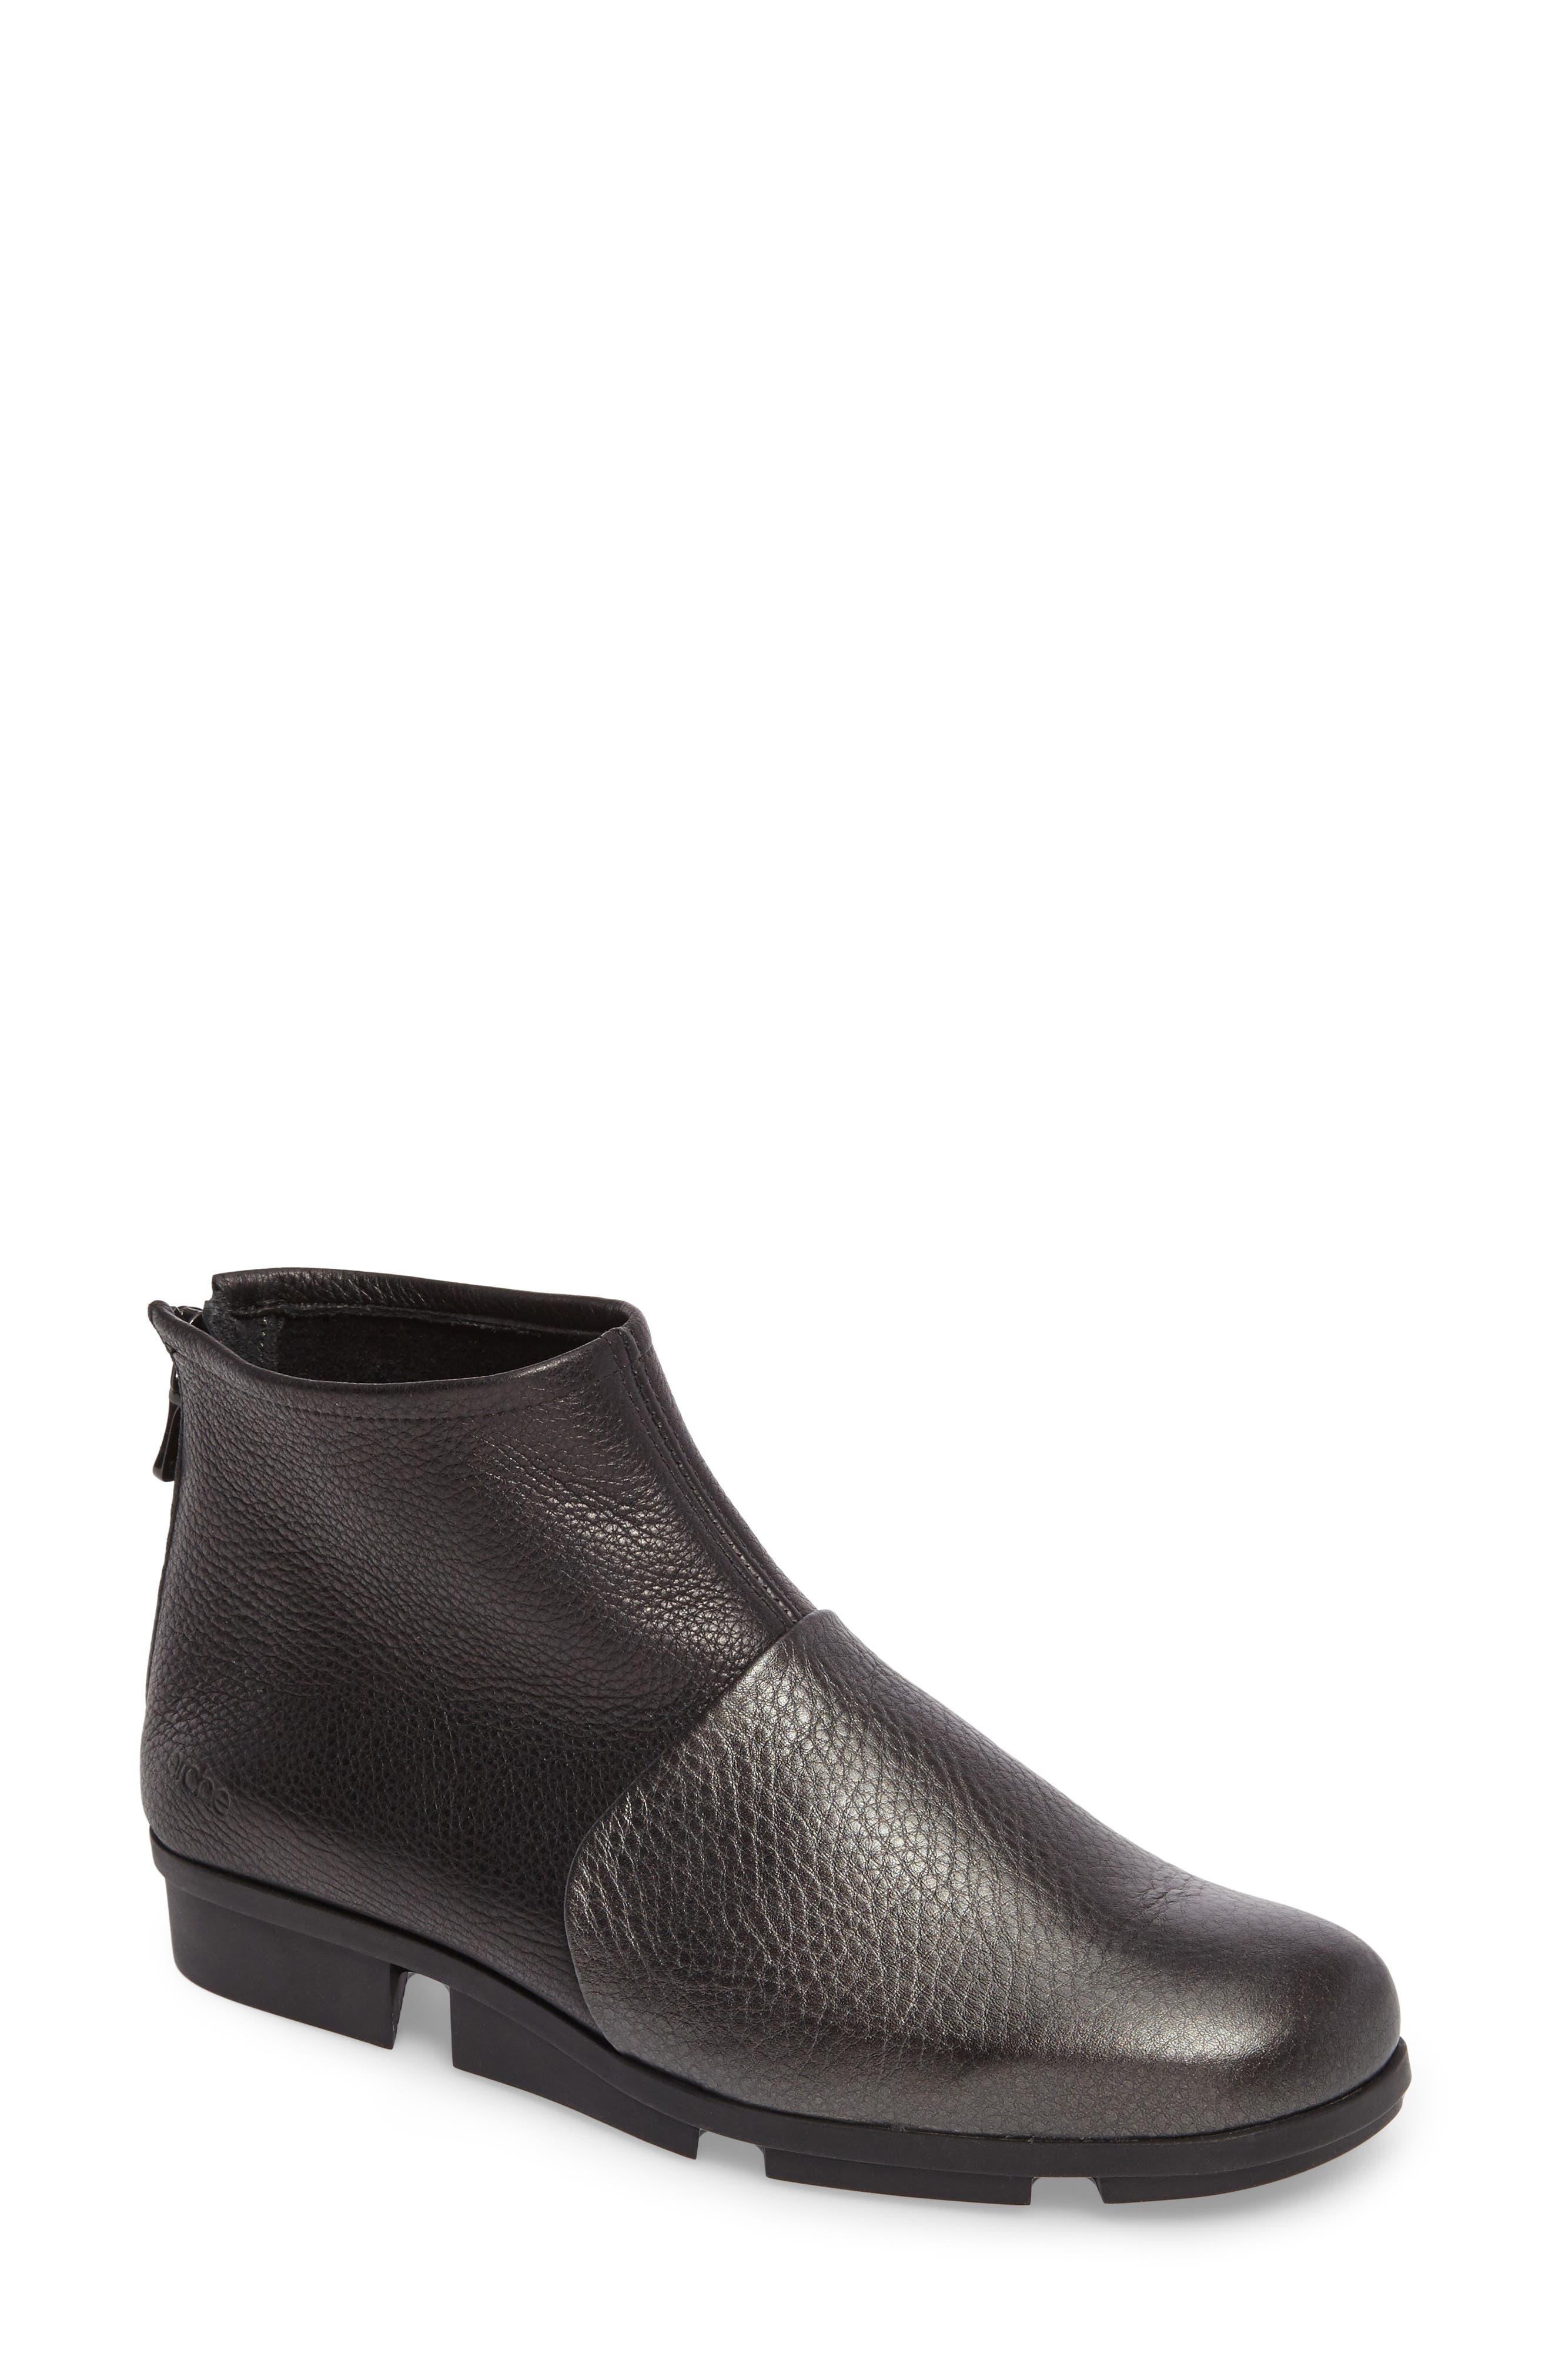 Kymono Boot,                         Main,                         color, 021